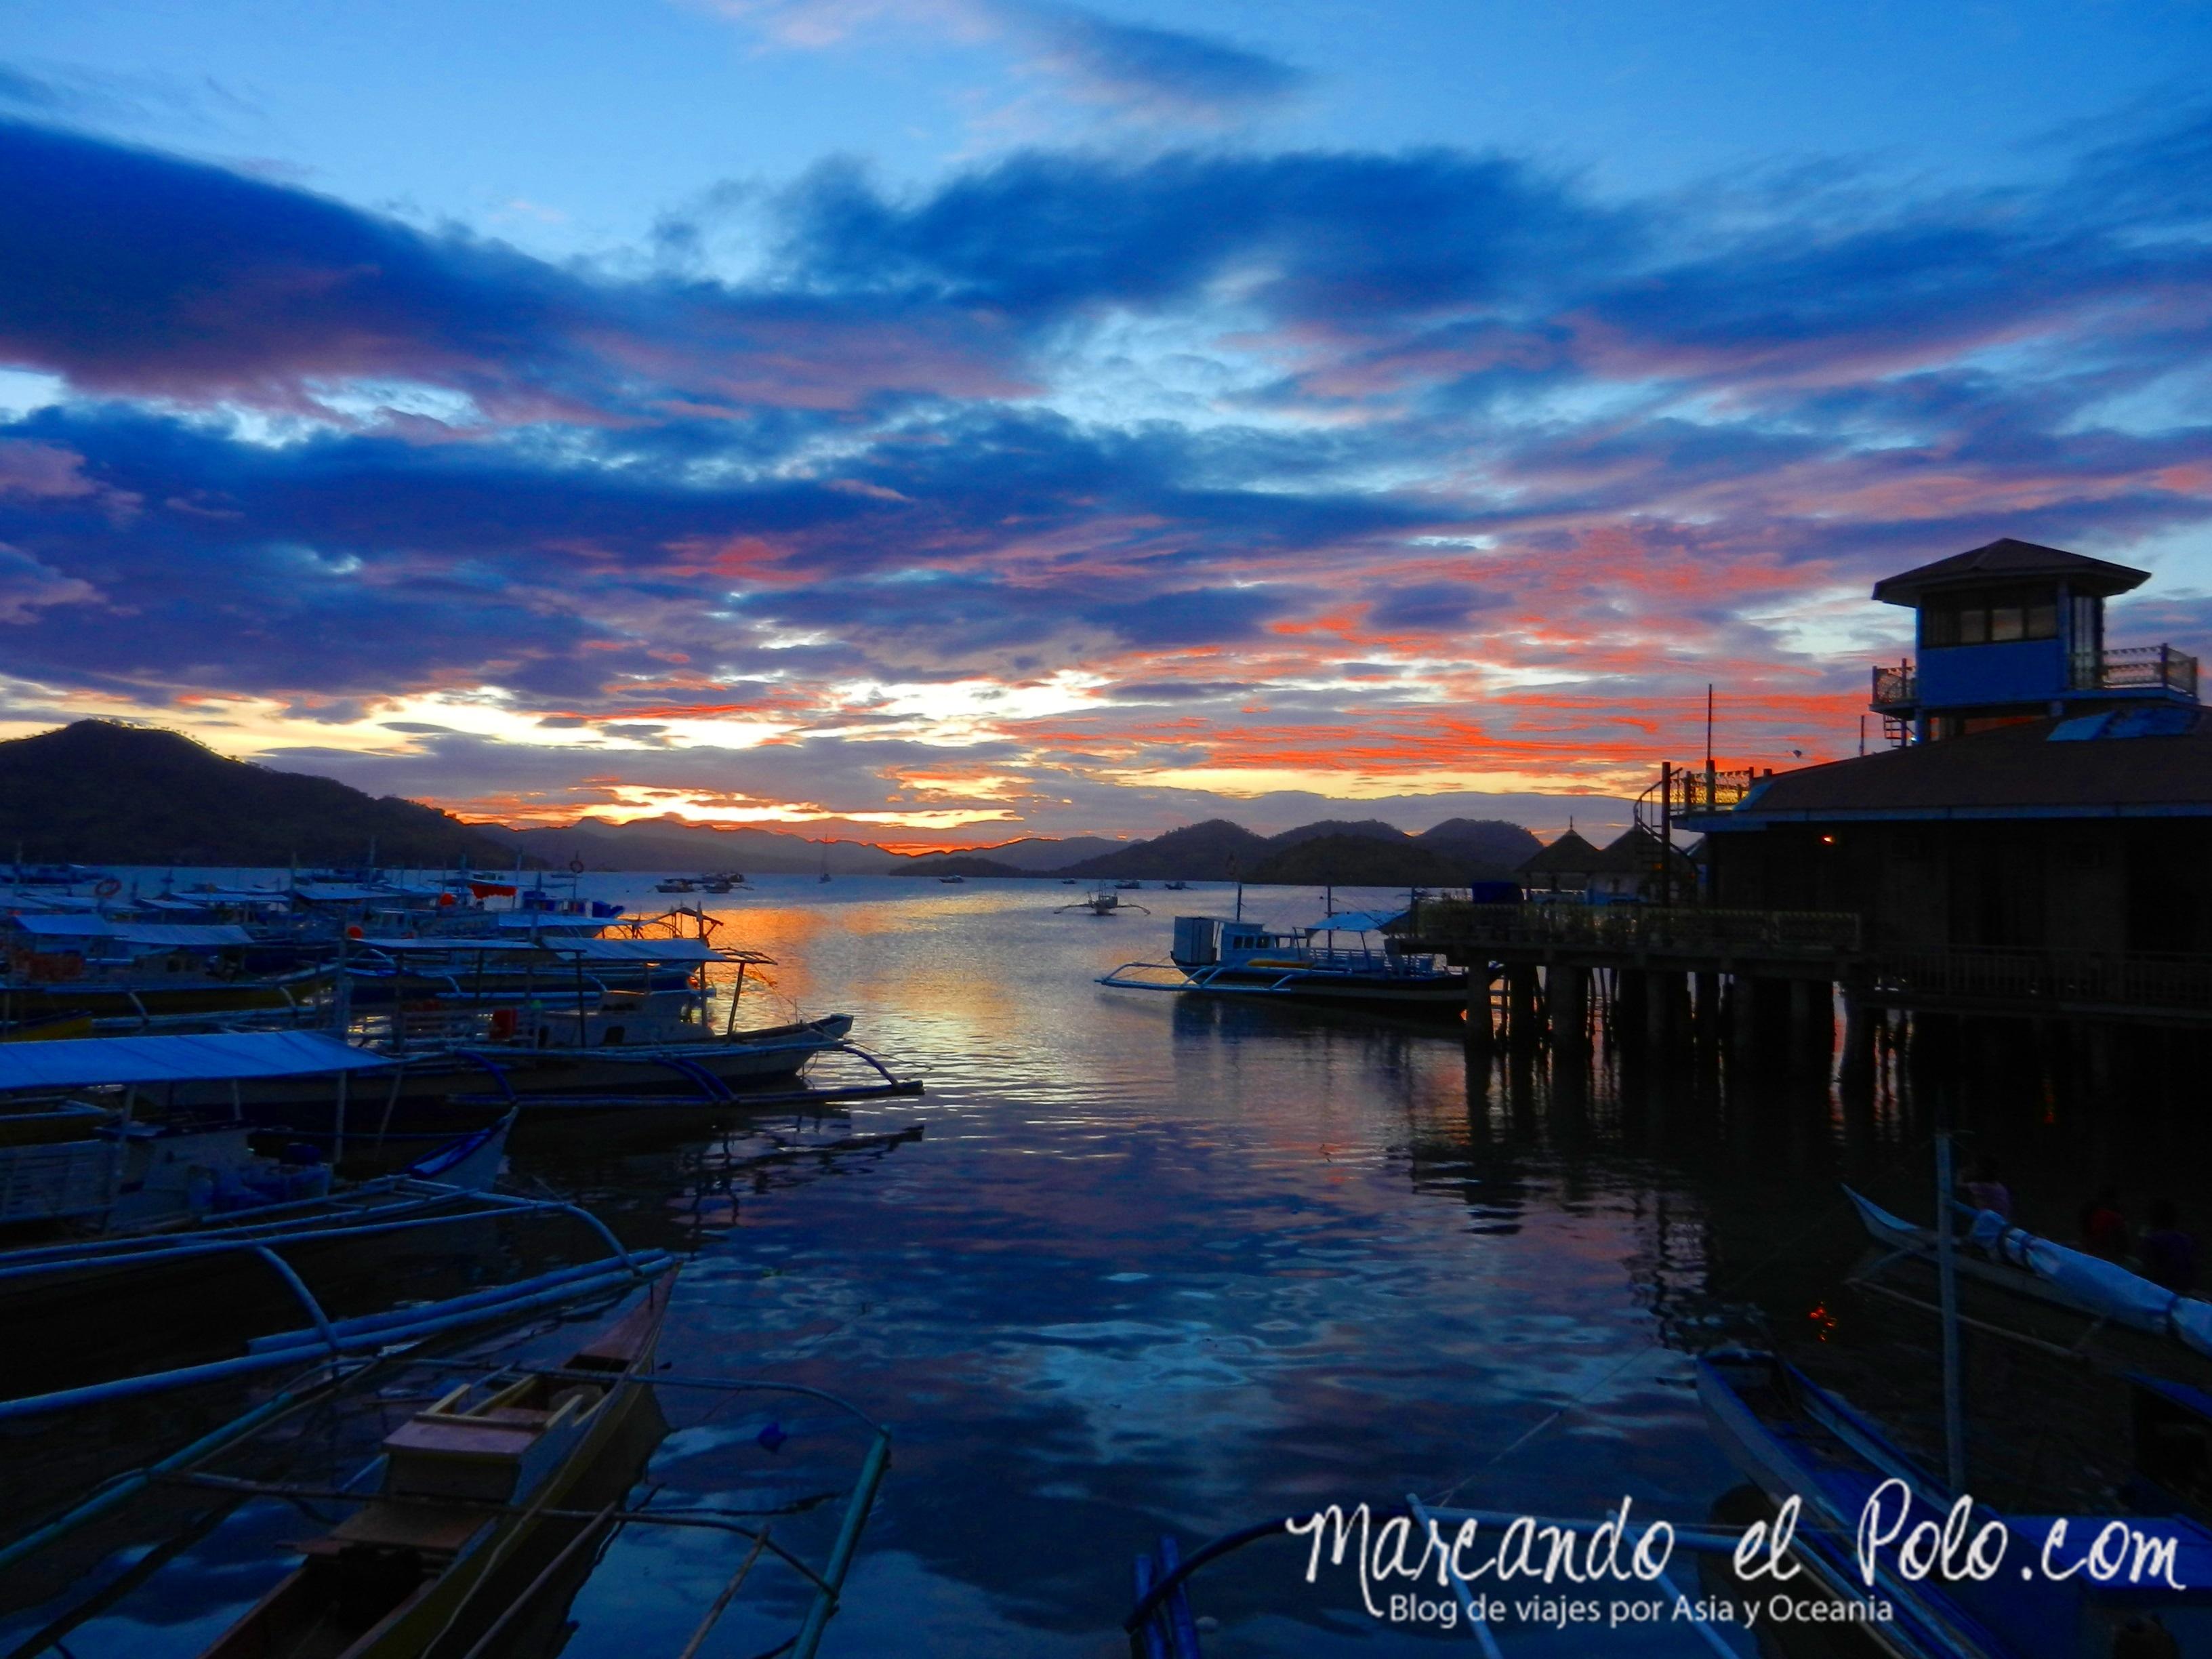 Viajar a Palawan: Atardecer en Corón.